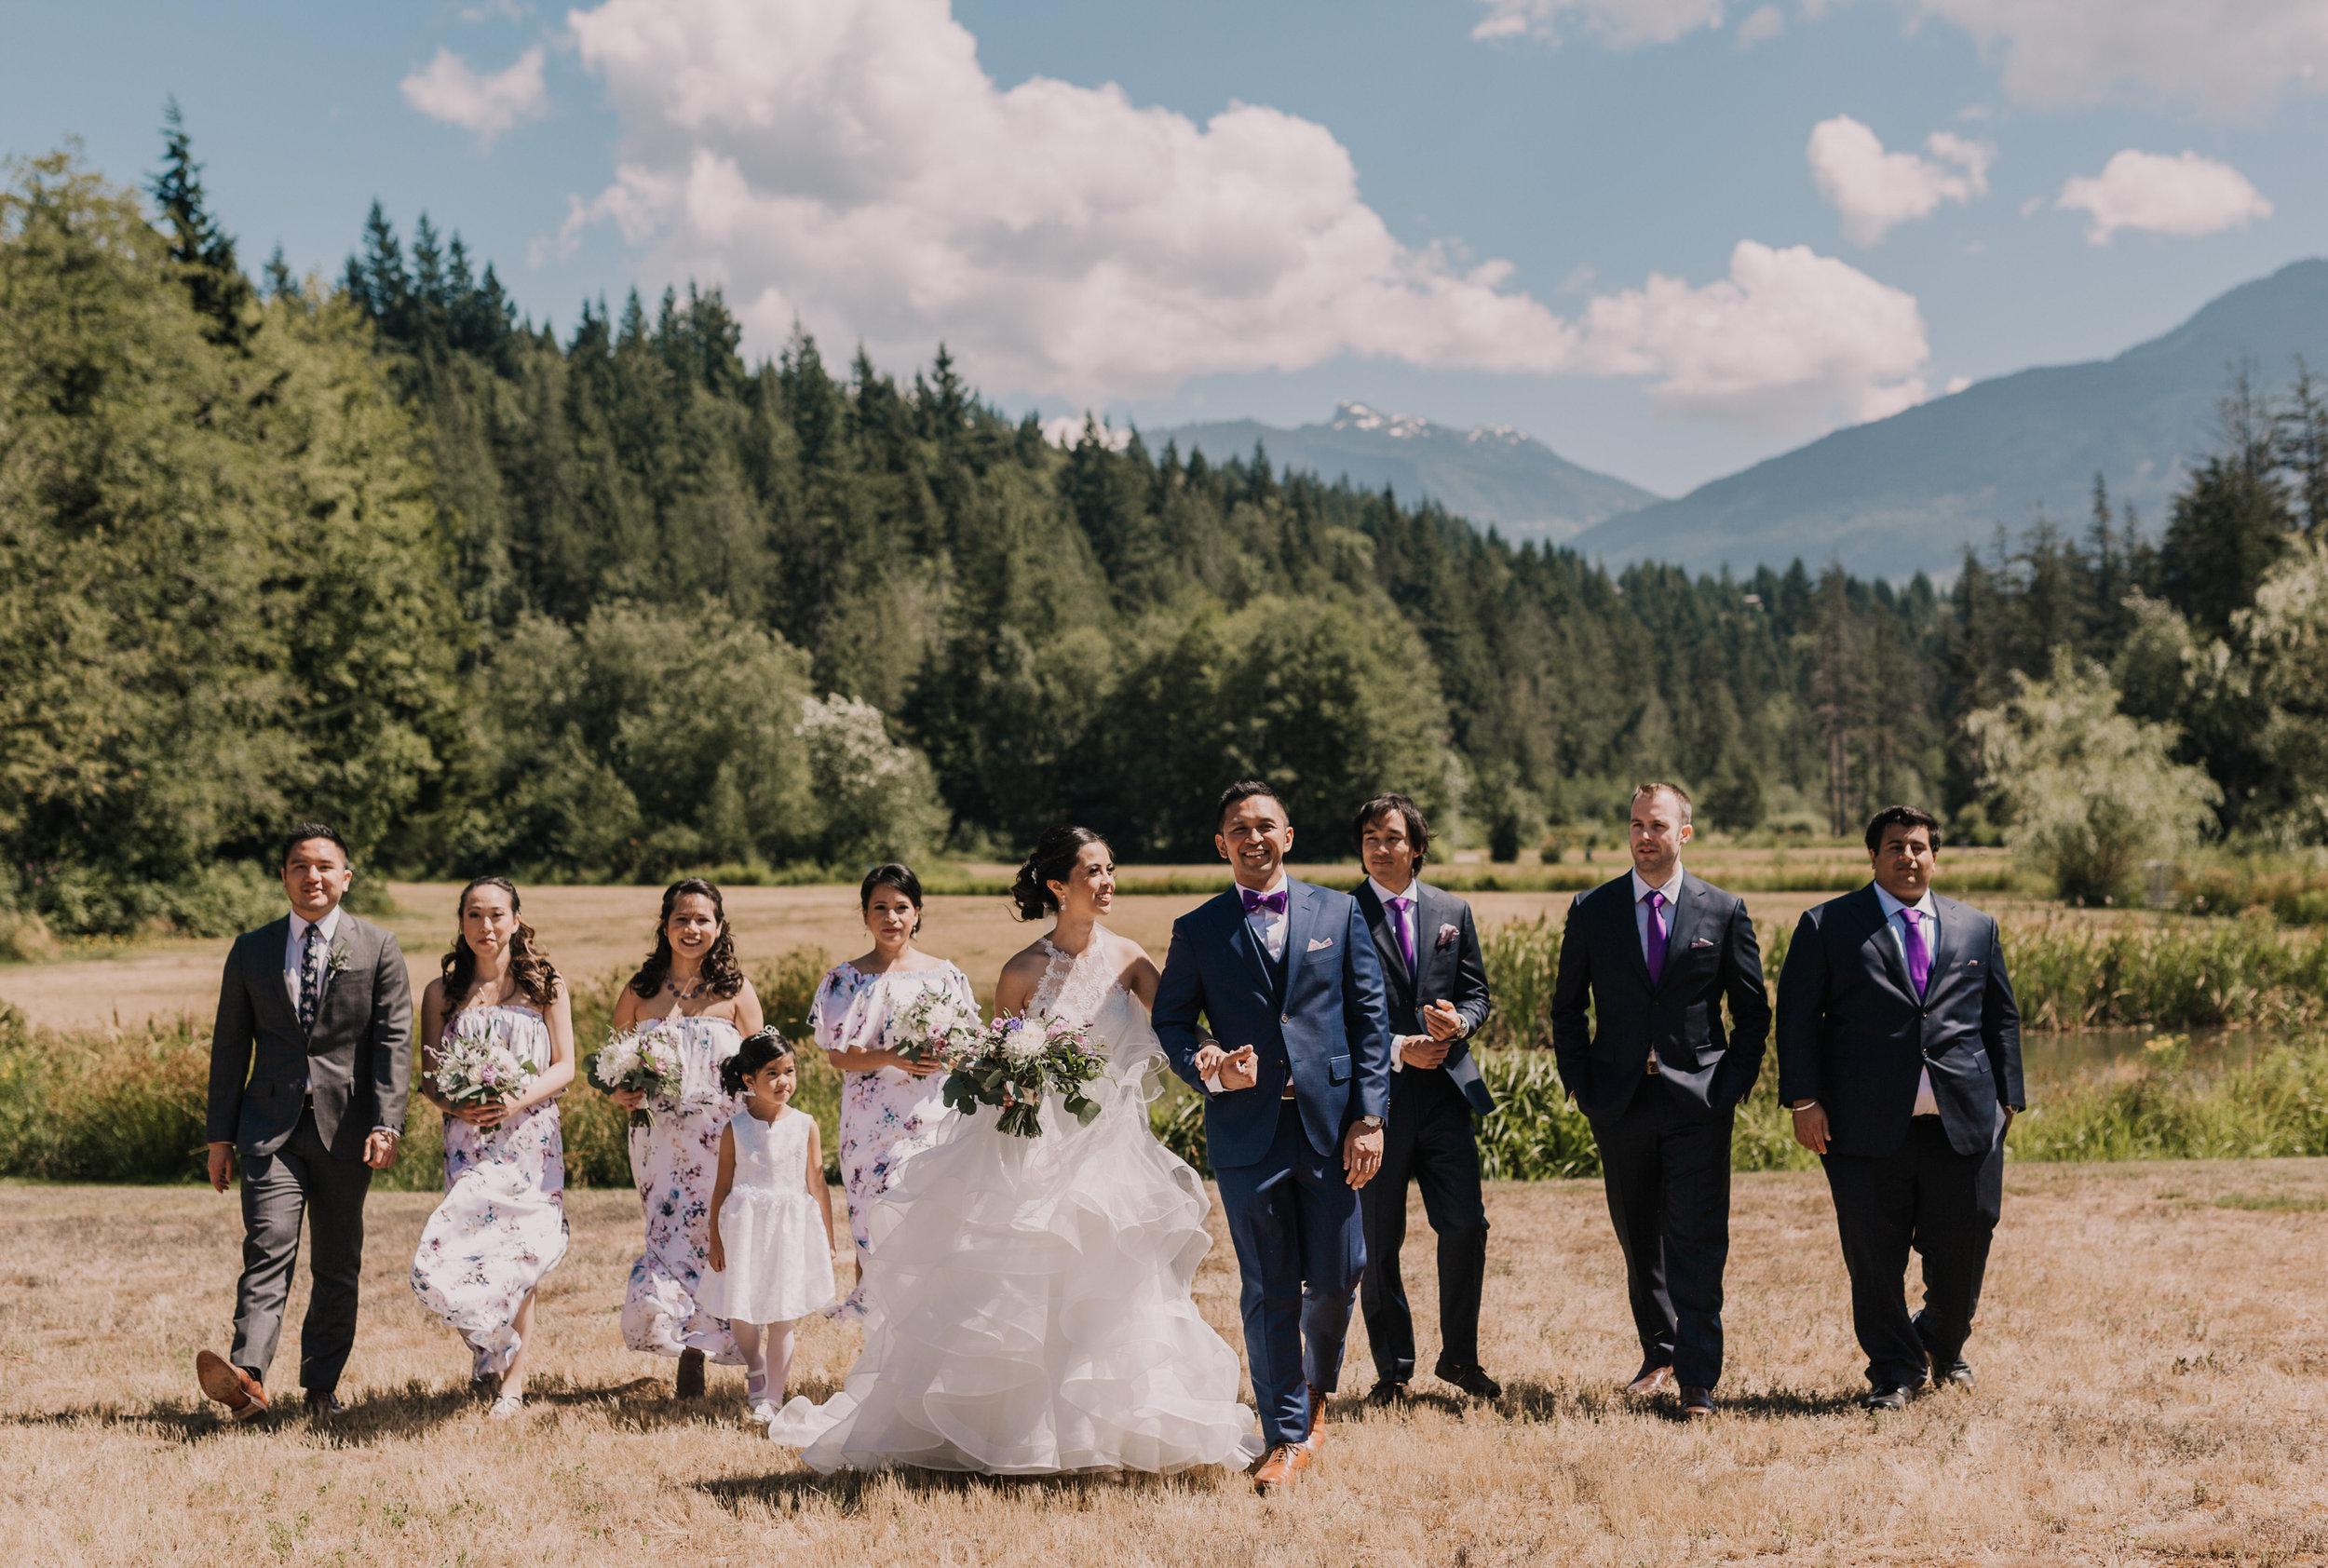 Squamish Wedding Photographer - Sea to Sky Gondola Wedding Photos -  Vancouver Wedding Photographer & Videographer - Sunshine Coast Wedding Photos - Sunshine Coast Wedding Photographer - Jennifer Picard Photography - IMG_2404_1.jpg